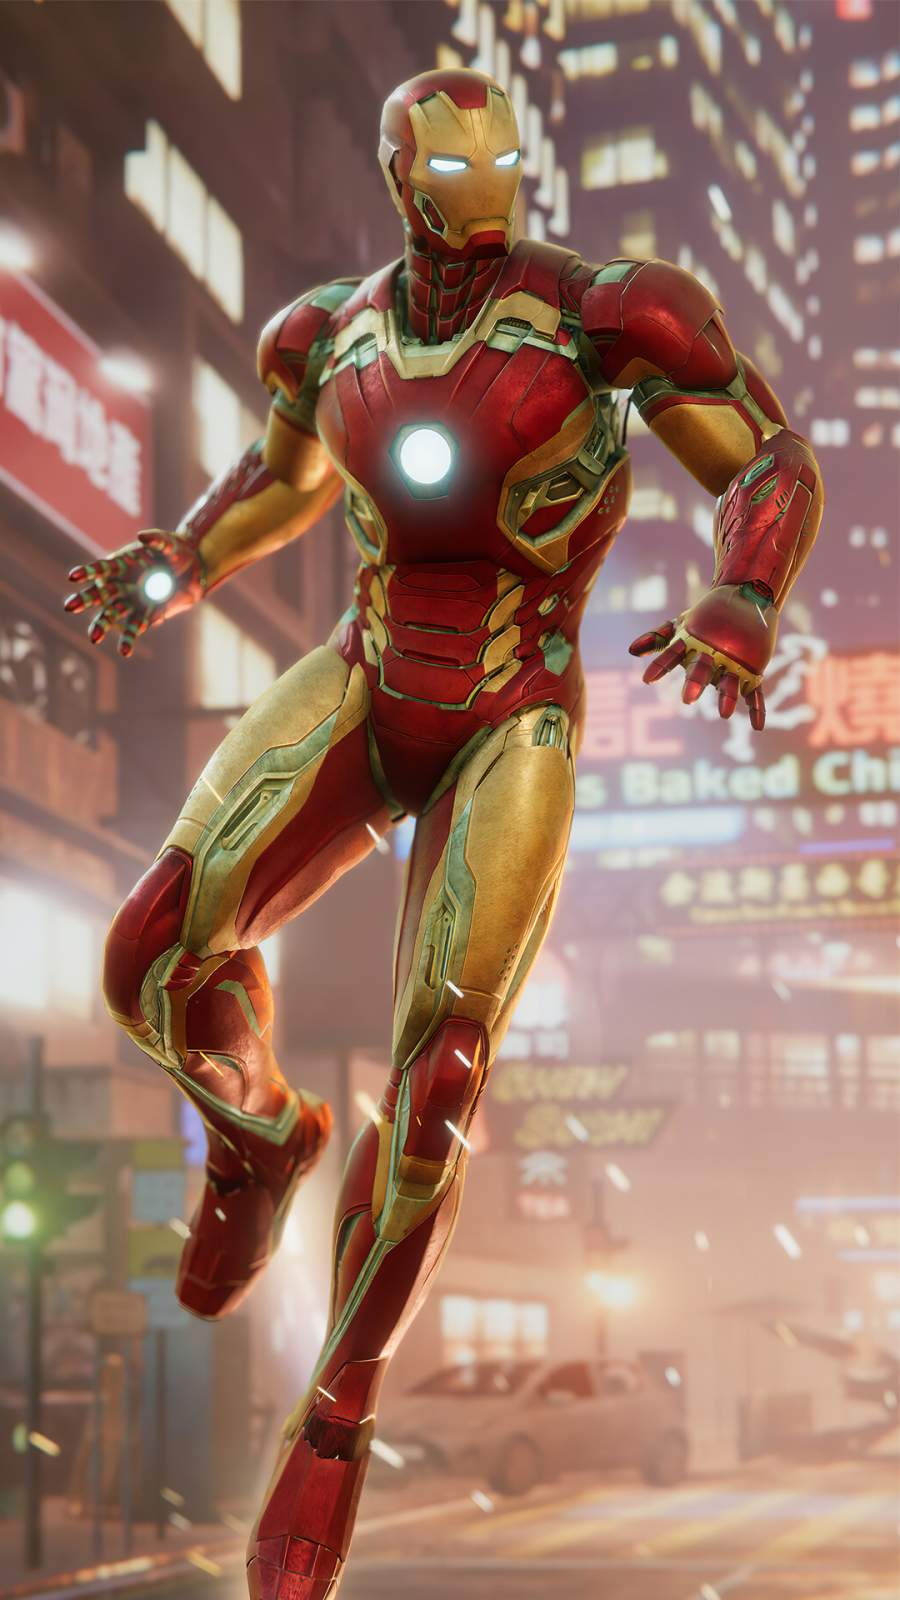 Iron Man Suit 4K iPhone Wallpaper